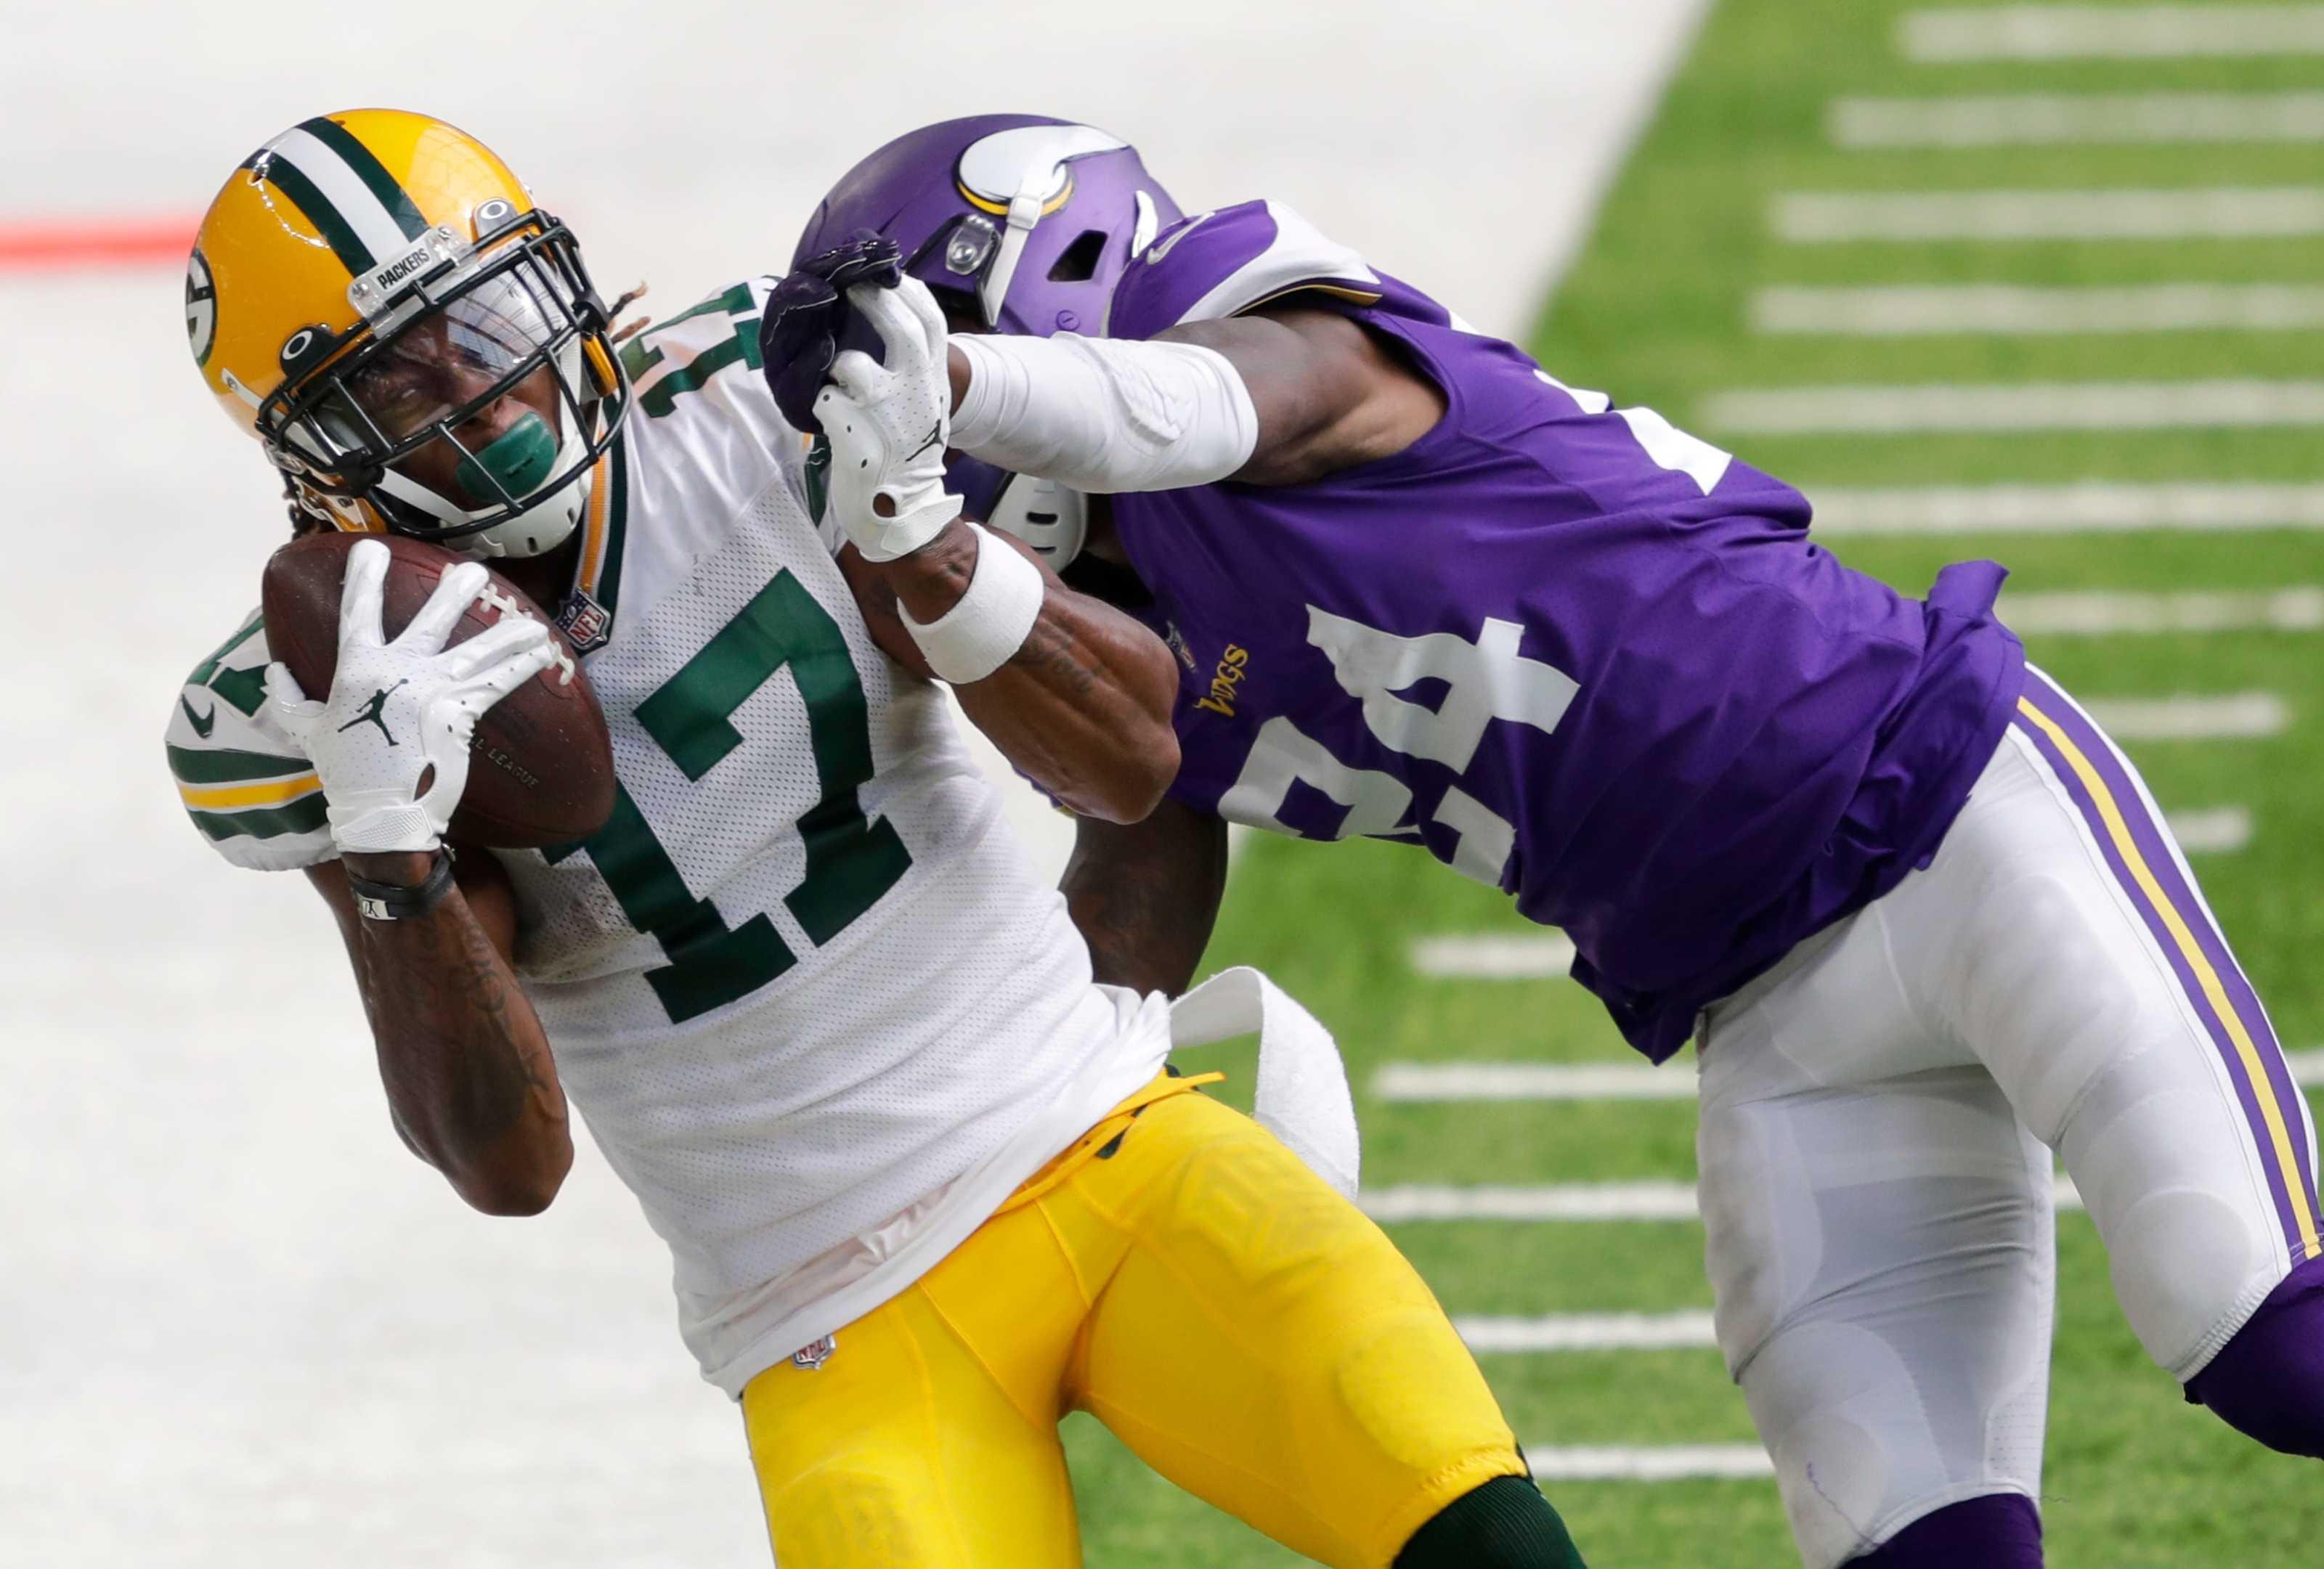 Green Bay Packers v. Vikings: Week 8 Predictions